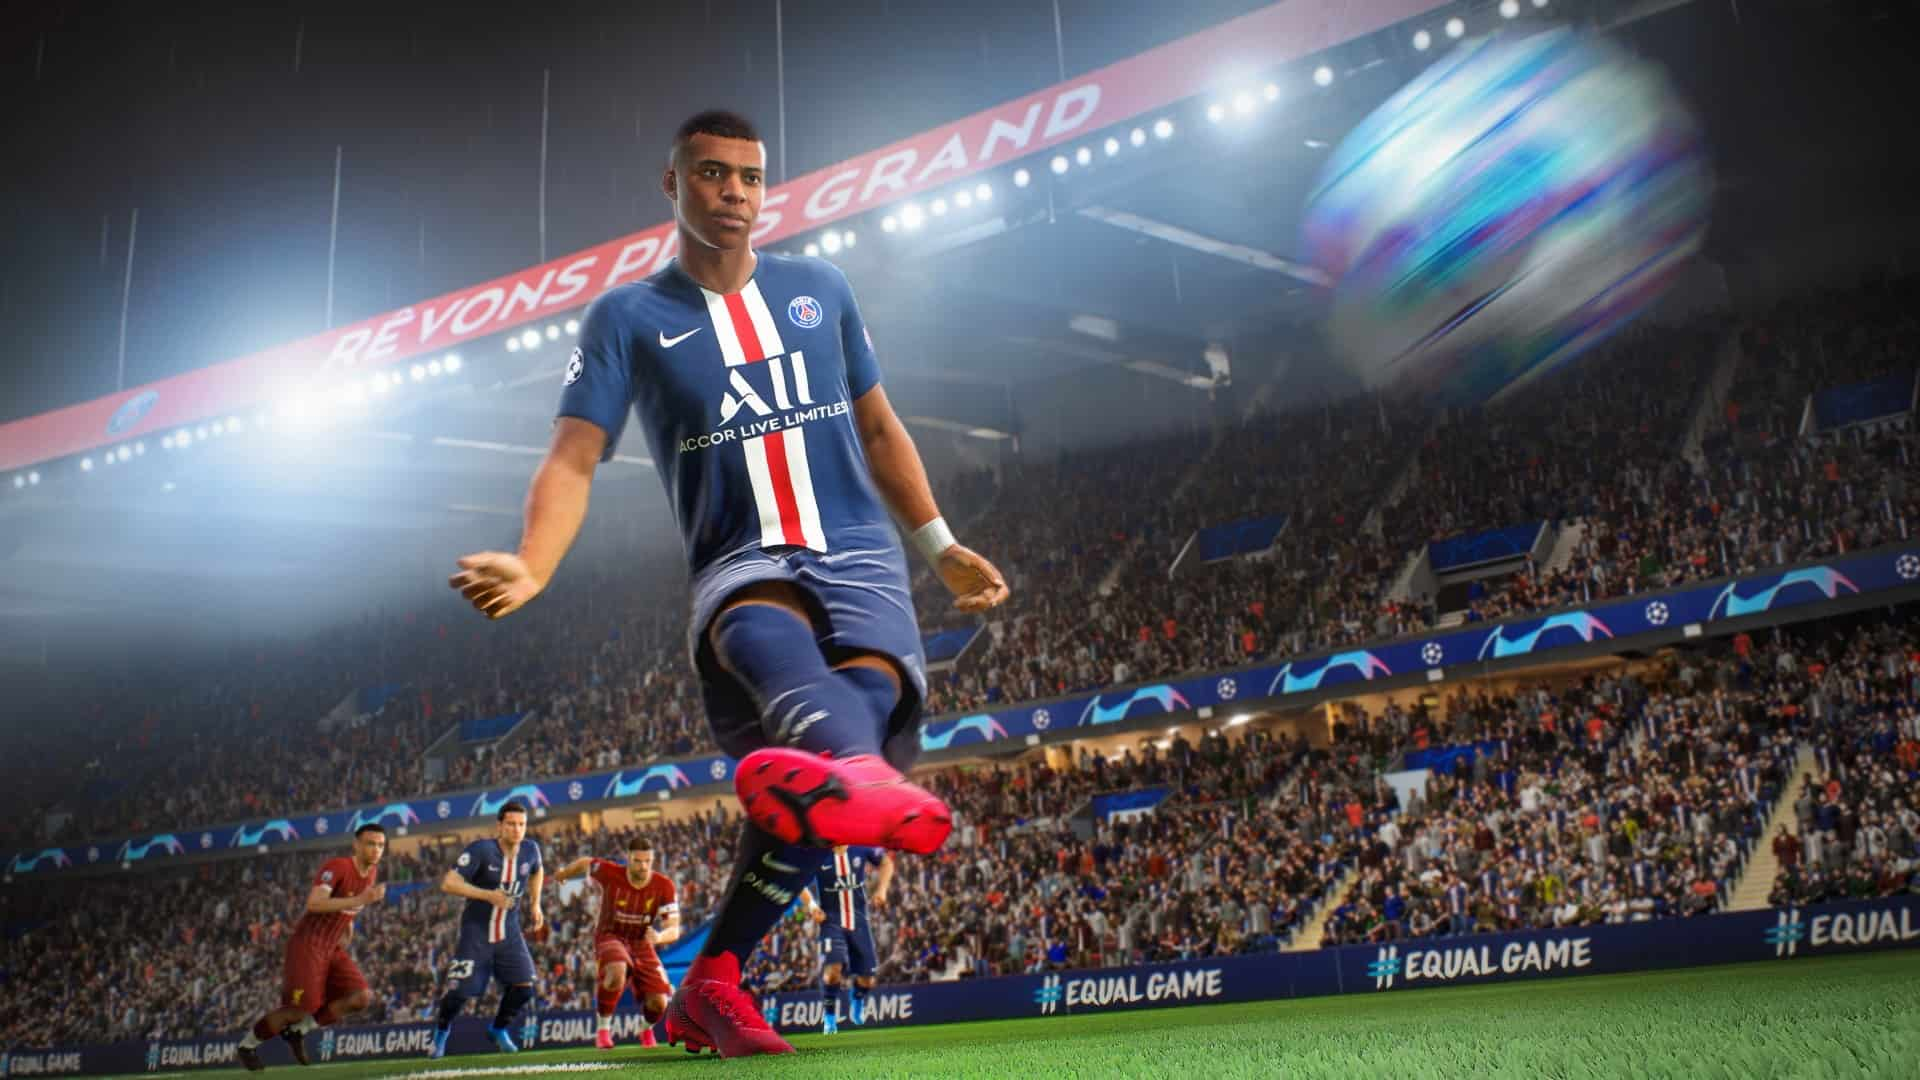 FIFA 21 Cristiano Ronaldo